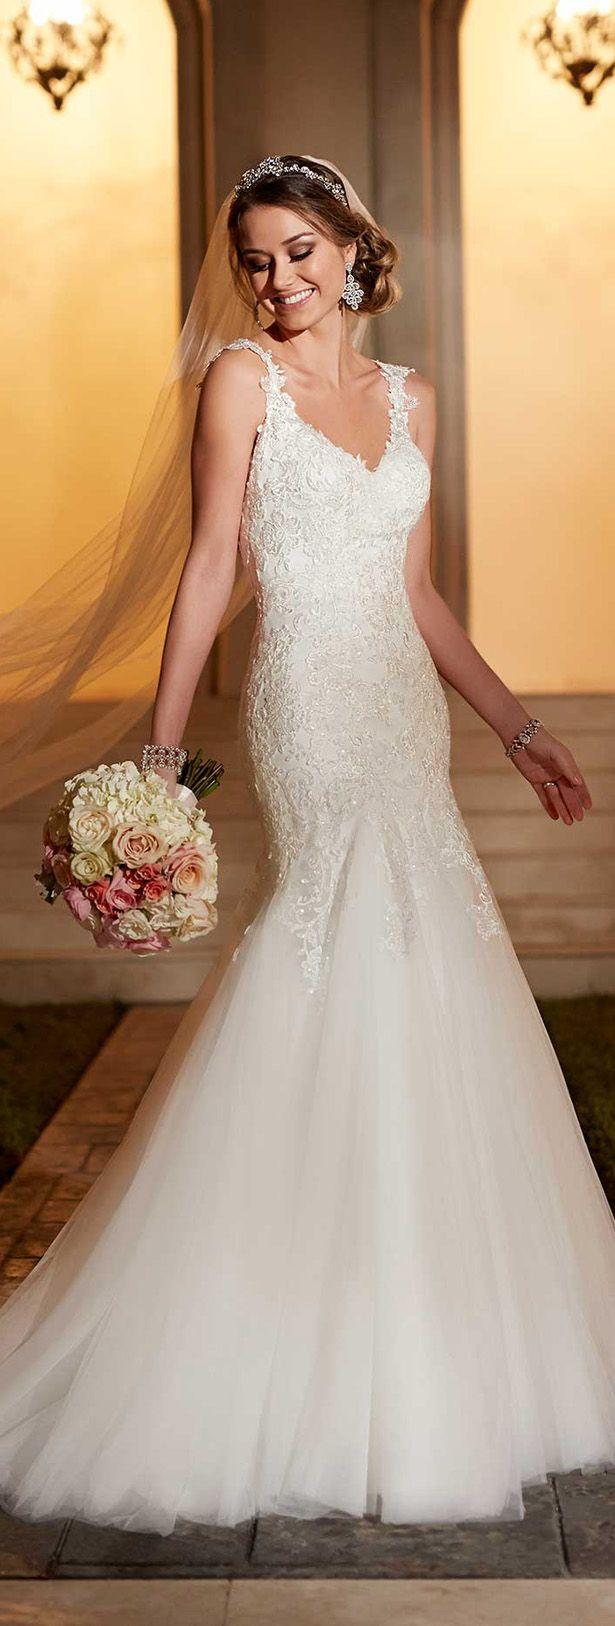 best weddings images on pinterest getting married wedding